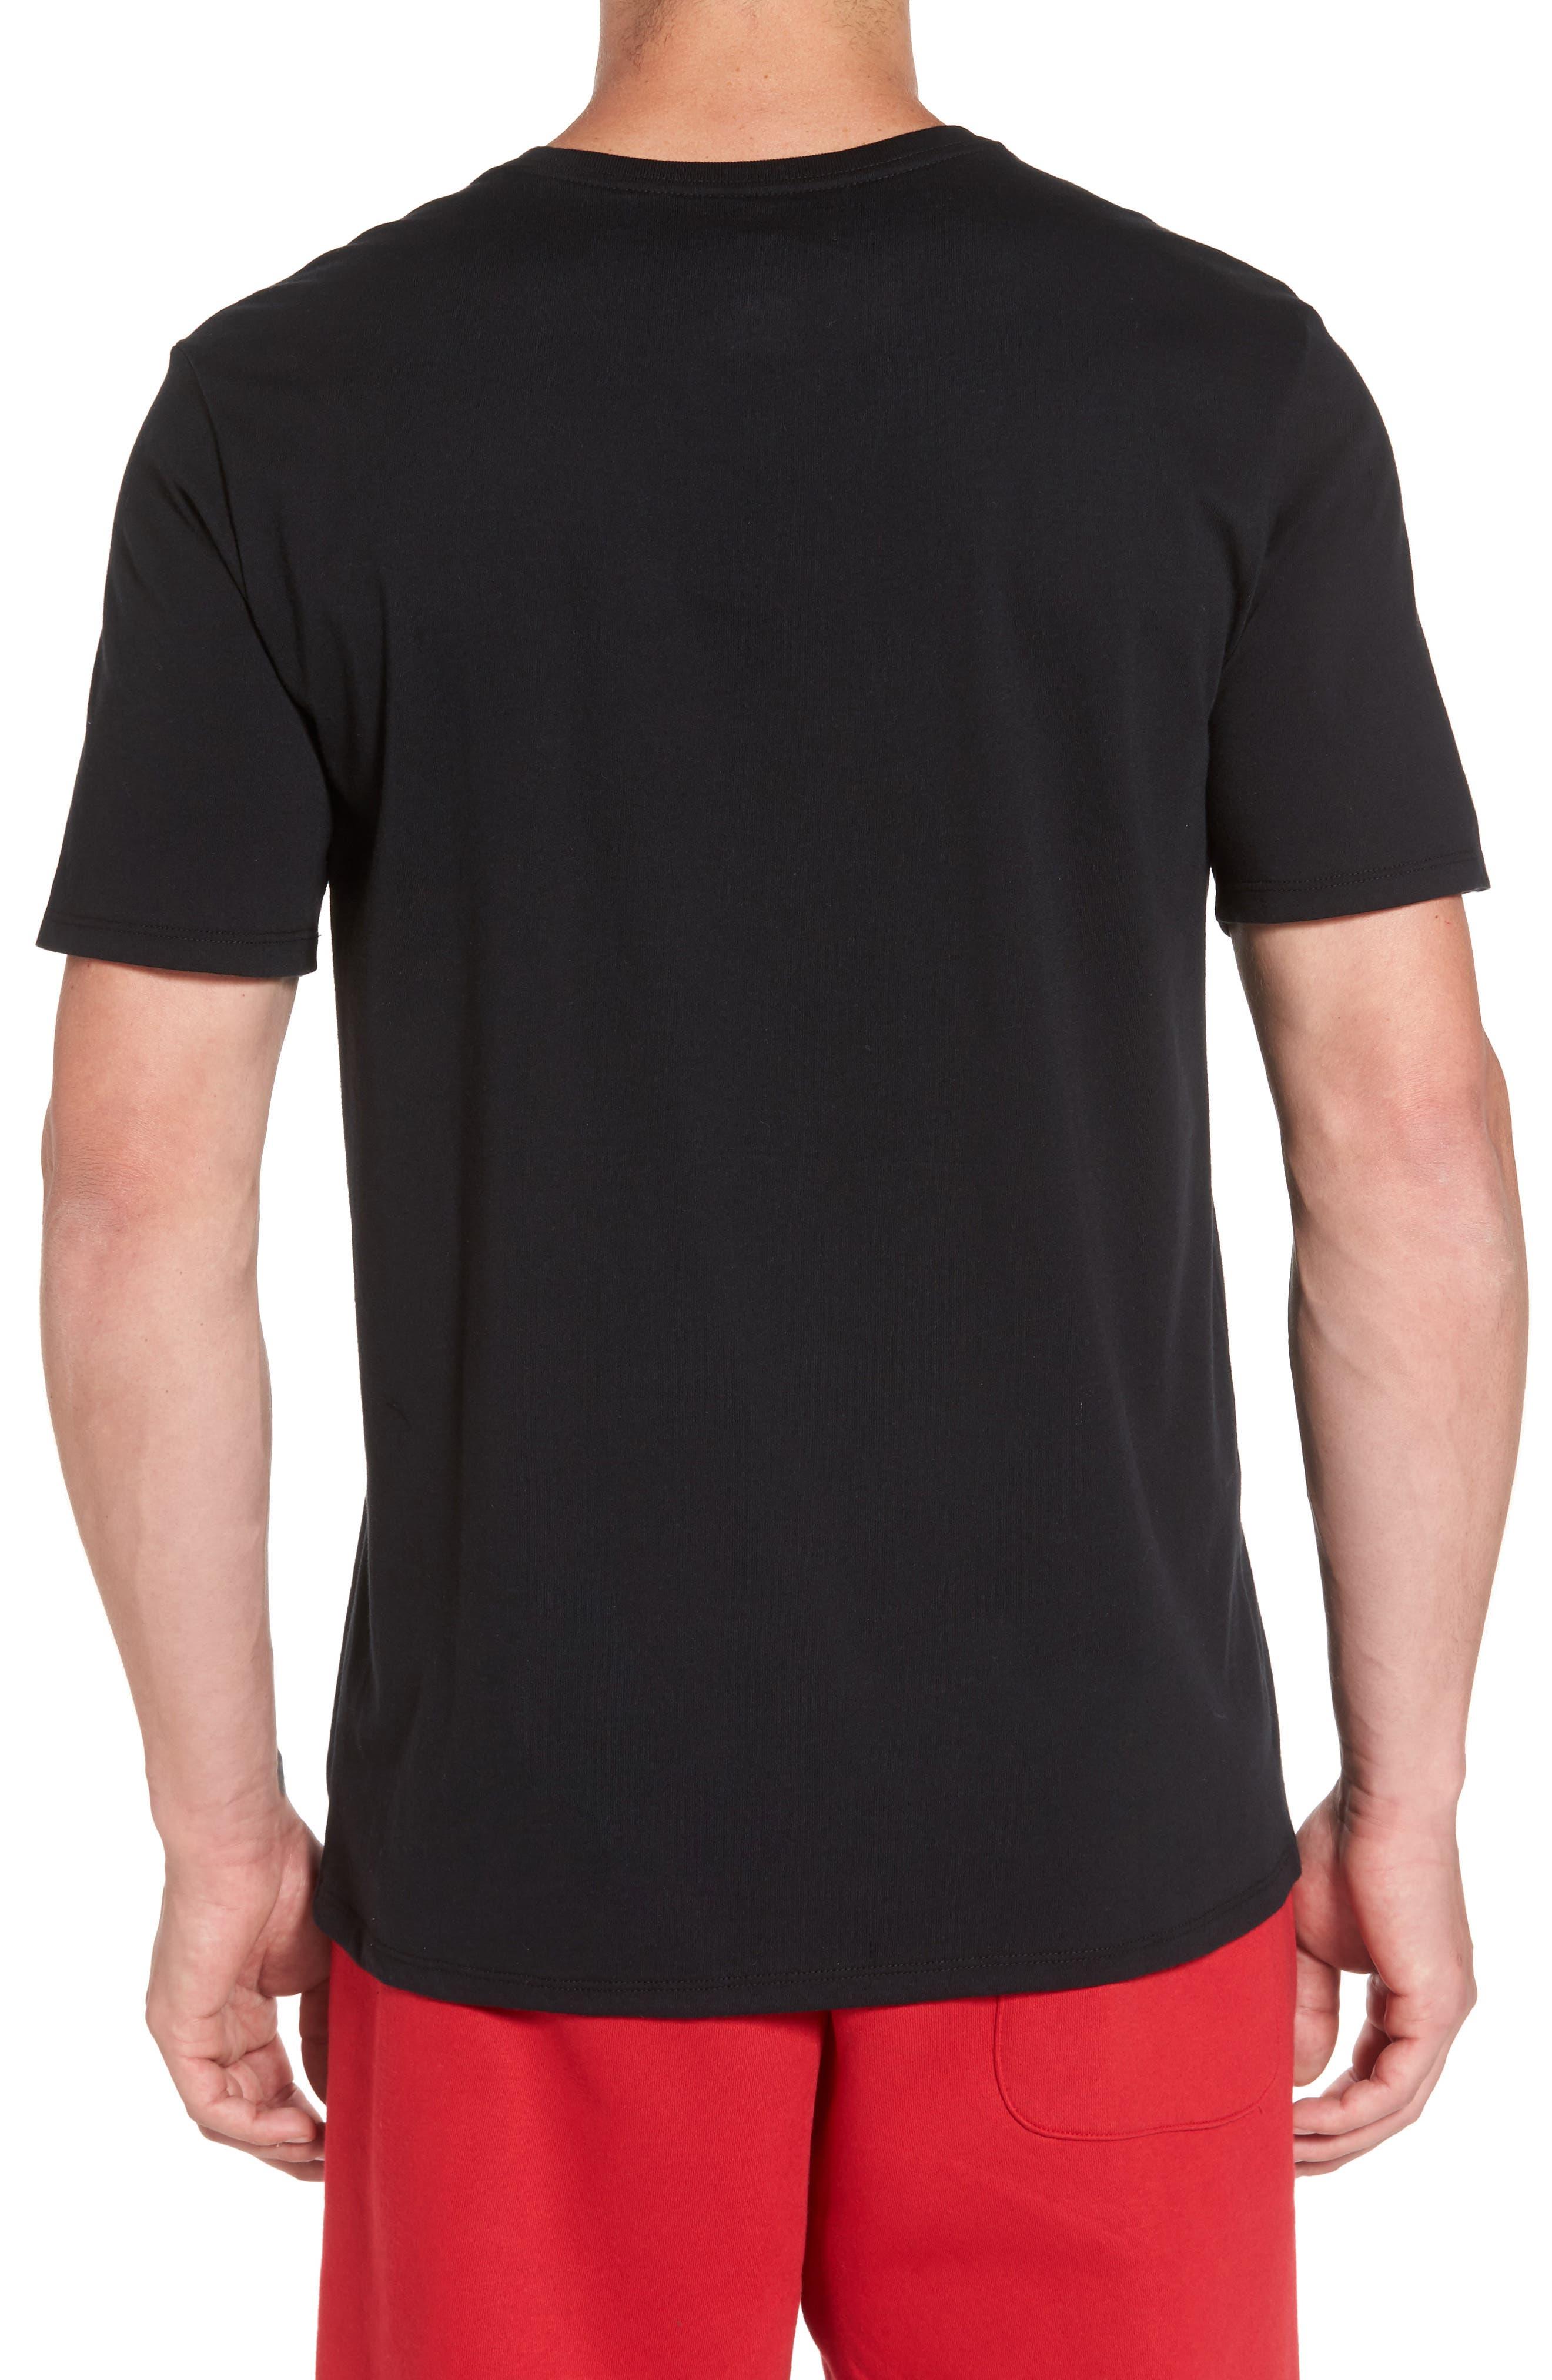 Sportswear AJ11 CNXN Graphic T-Shirt,                             Alternate thumbnail 2, color,                             Black